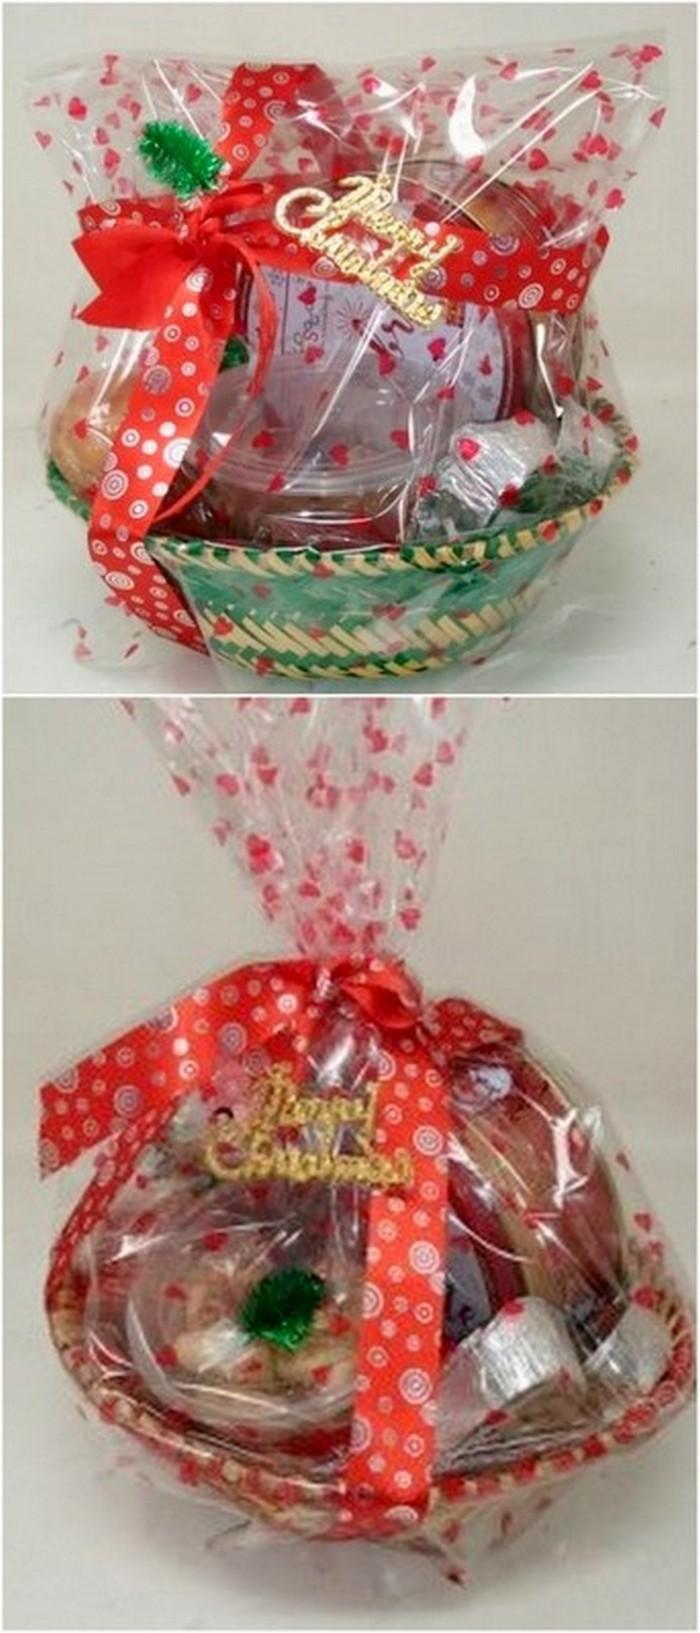 interesting design of gift basket